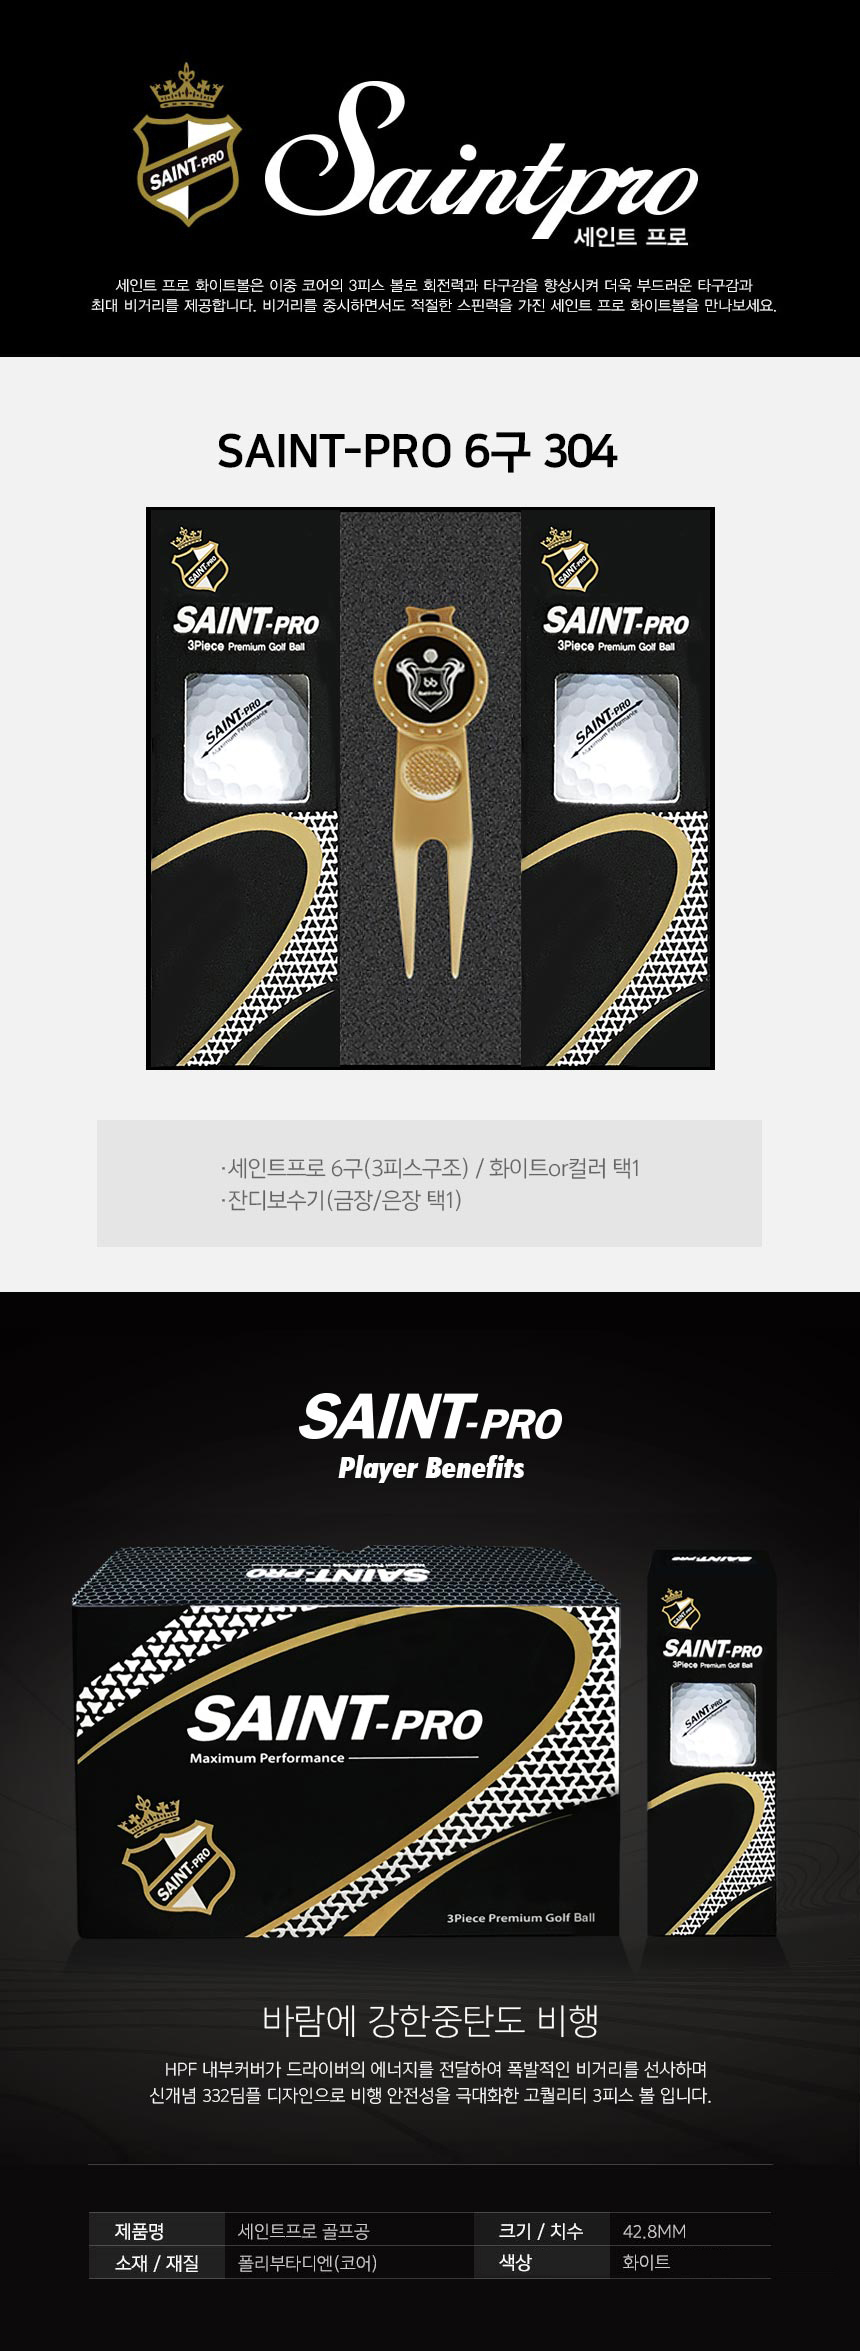 saint-pro-6-304.jpg